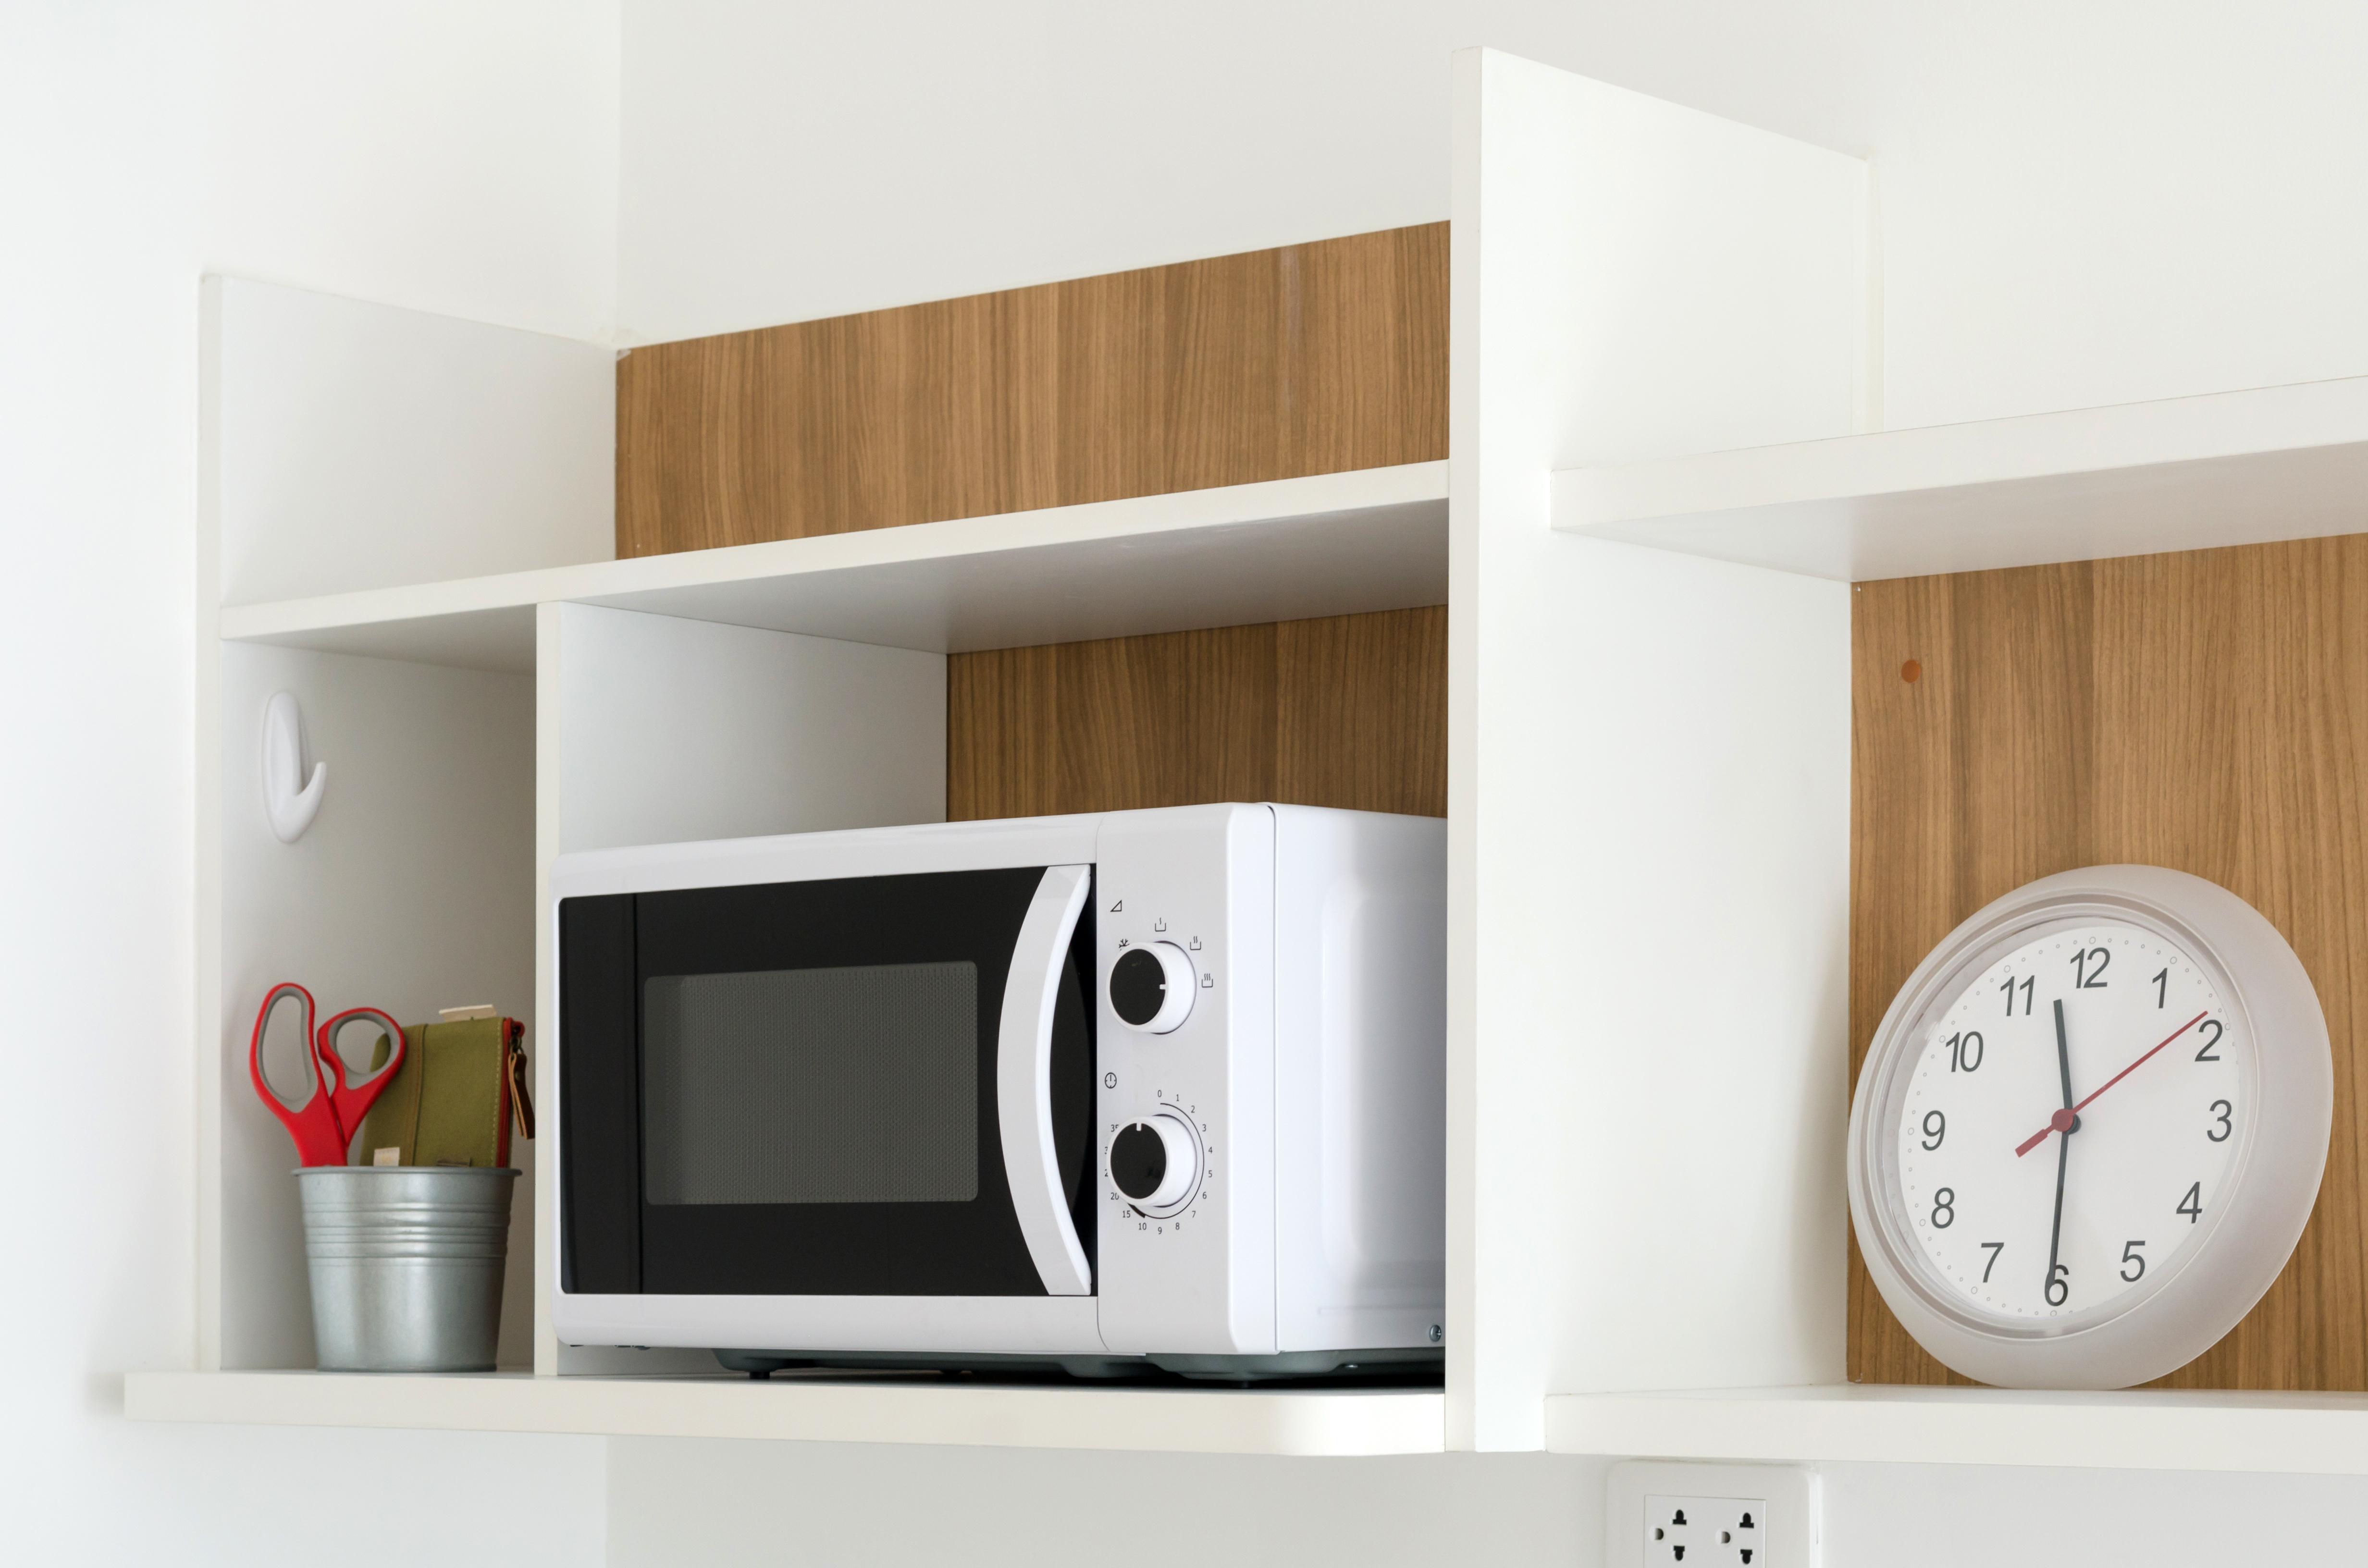 16 v c o kter ch jste netu ili e va e mikrovlnka dok e aukro blog. Black Bedroom Furniture Sets. Home Design Ideas